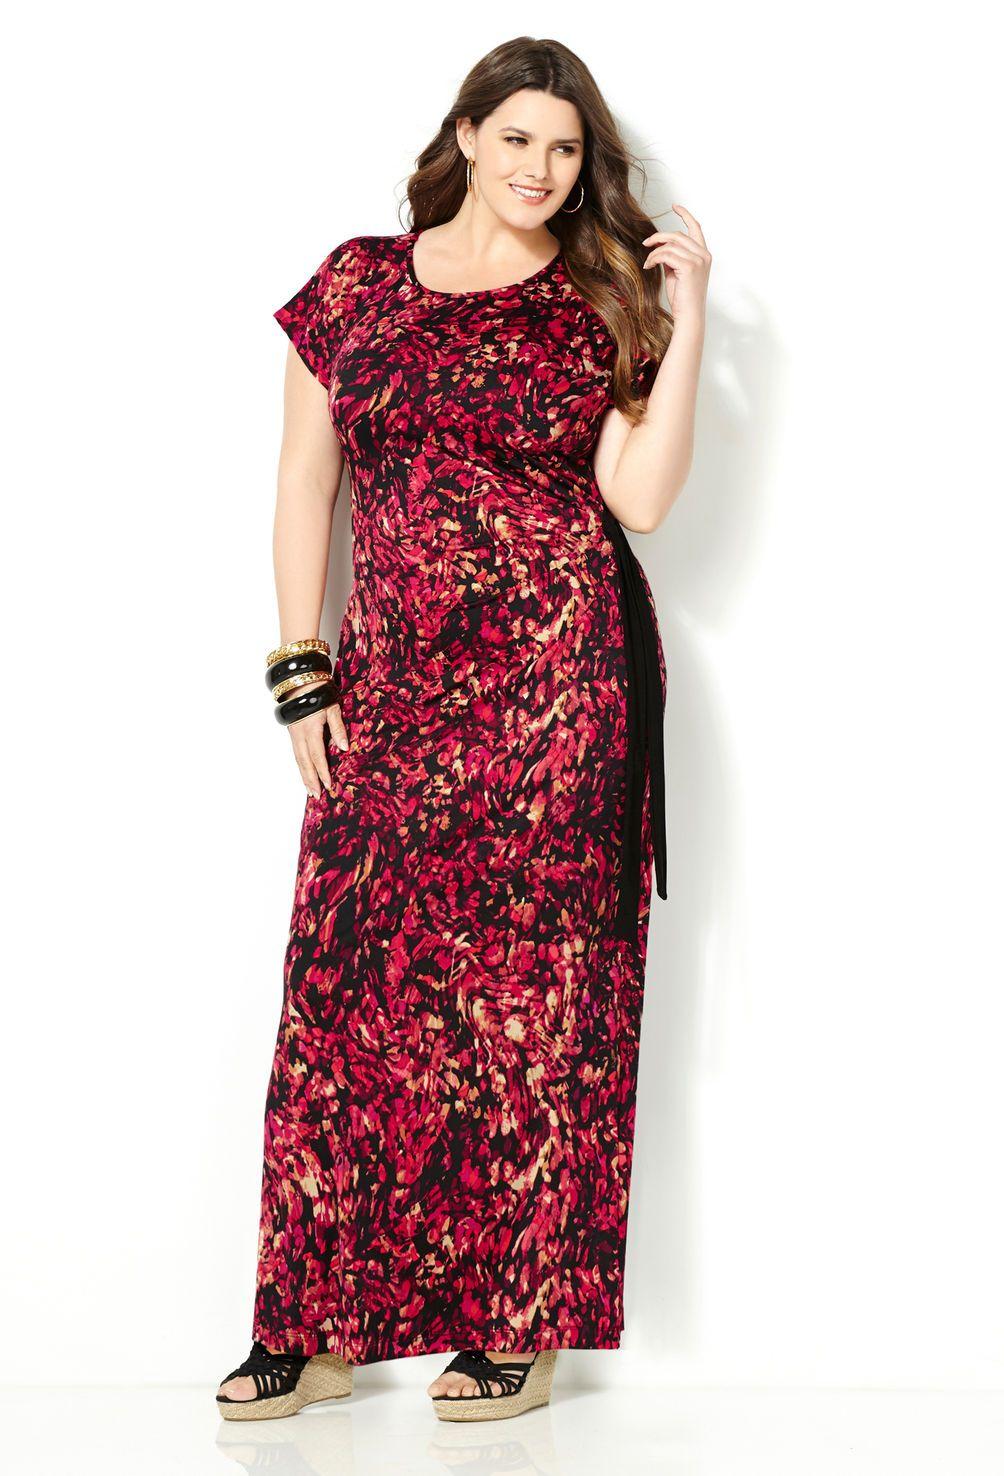 Brushed Floral Maxi Dress Plus Size Maxi Dress Avenue Red Floral Maxi Dress Plus Size Fashion Plus Size Maxi Dresses [ 1476 x 1004 Pixel ]